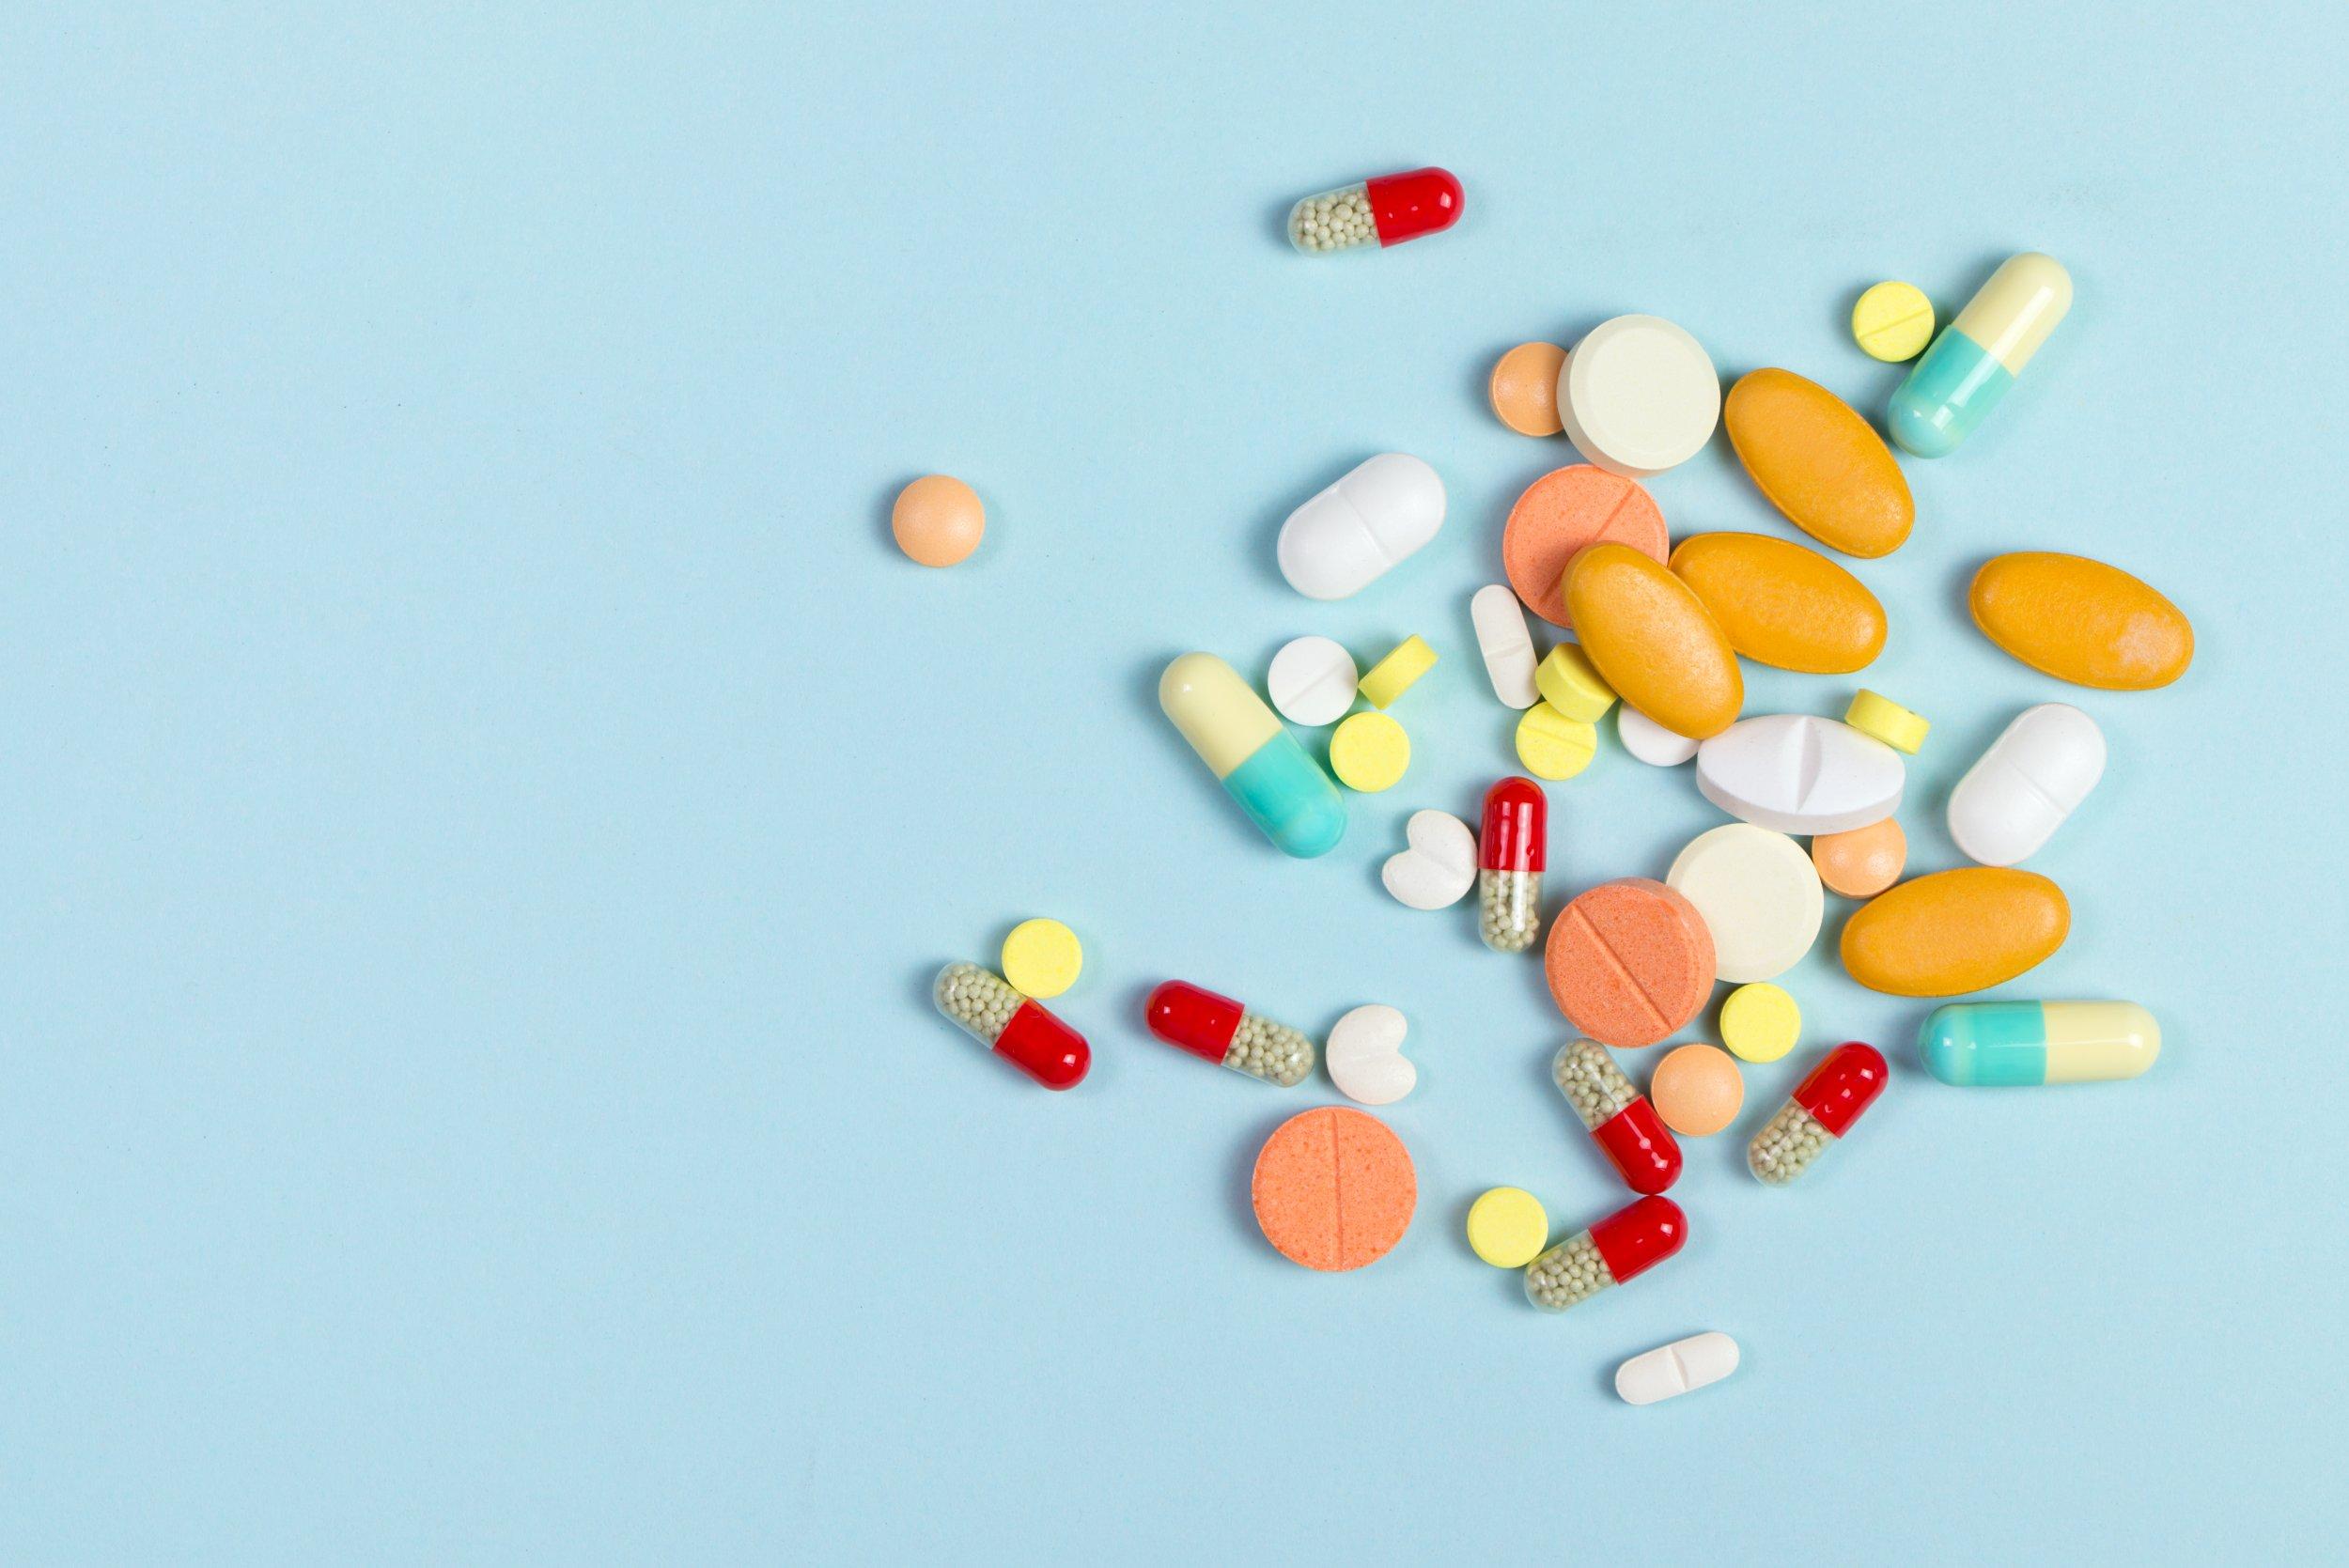 vitamins-pills-stock